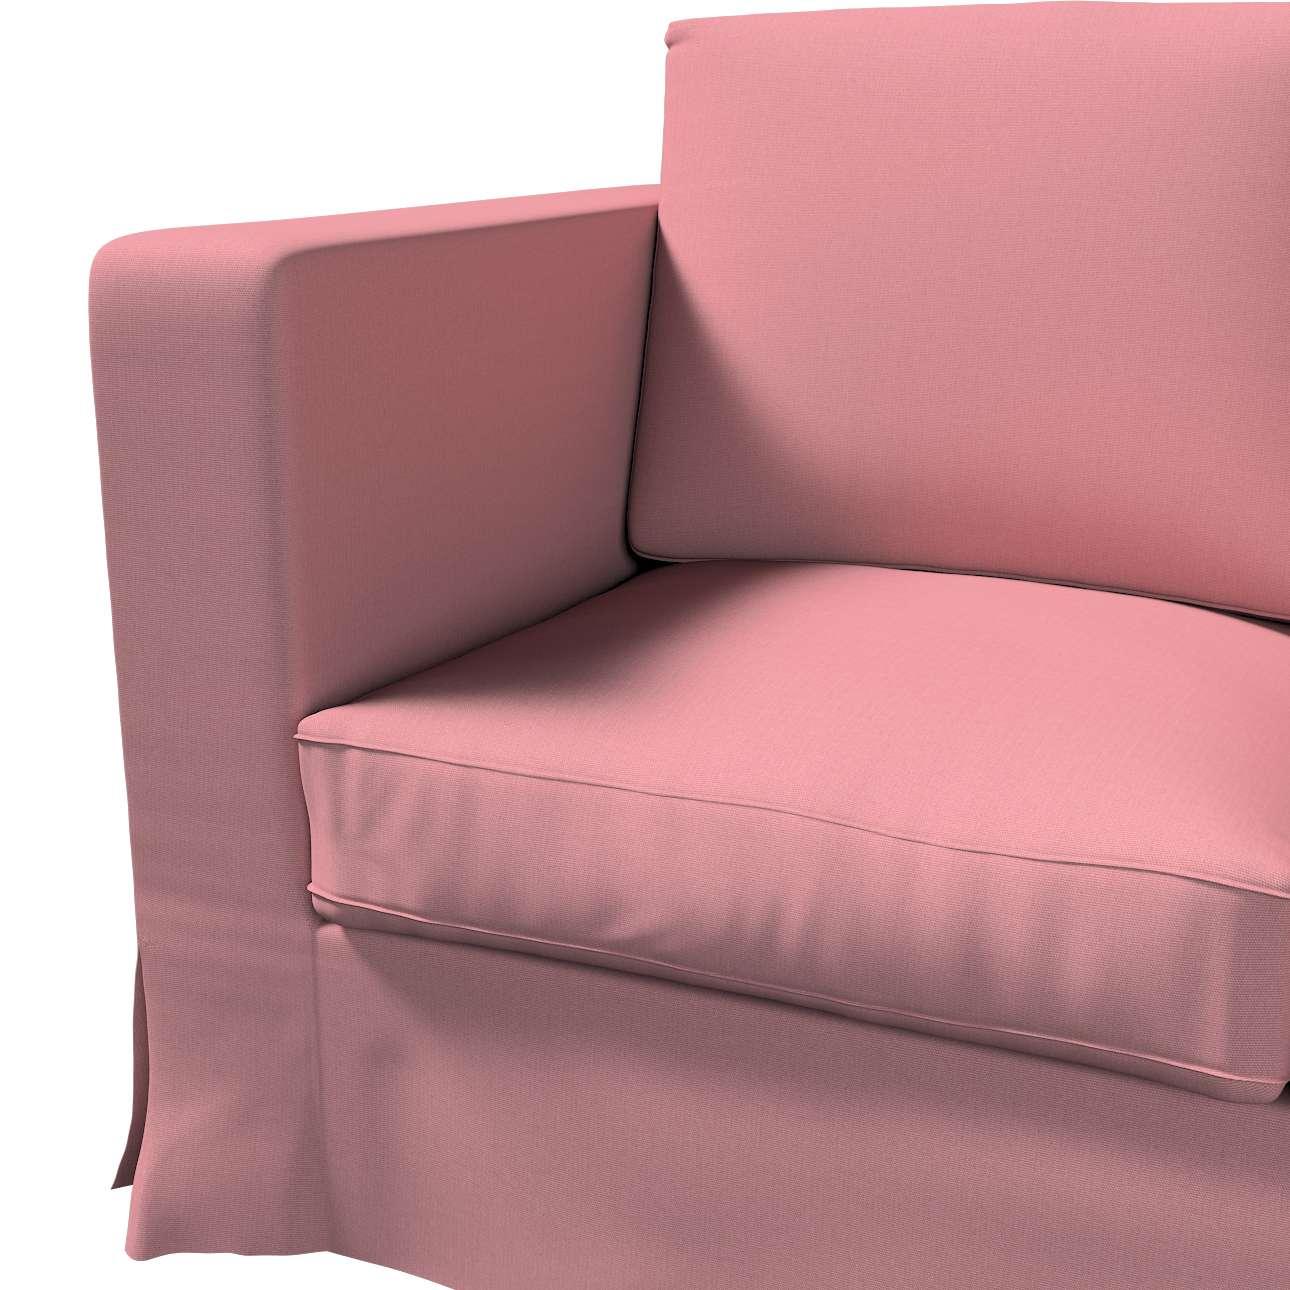 Karlanda klädsel 3-sits soffa - lång i kollektionen Panama Cotton, Tyg: 702-43